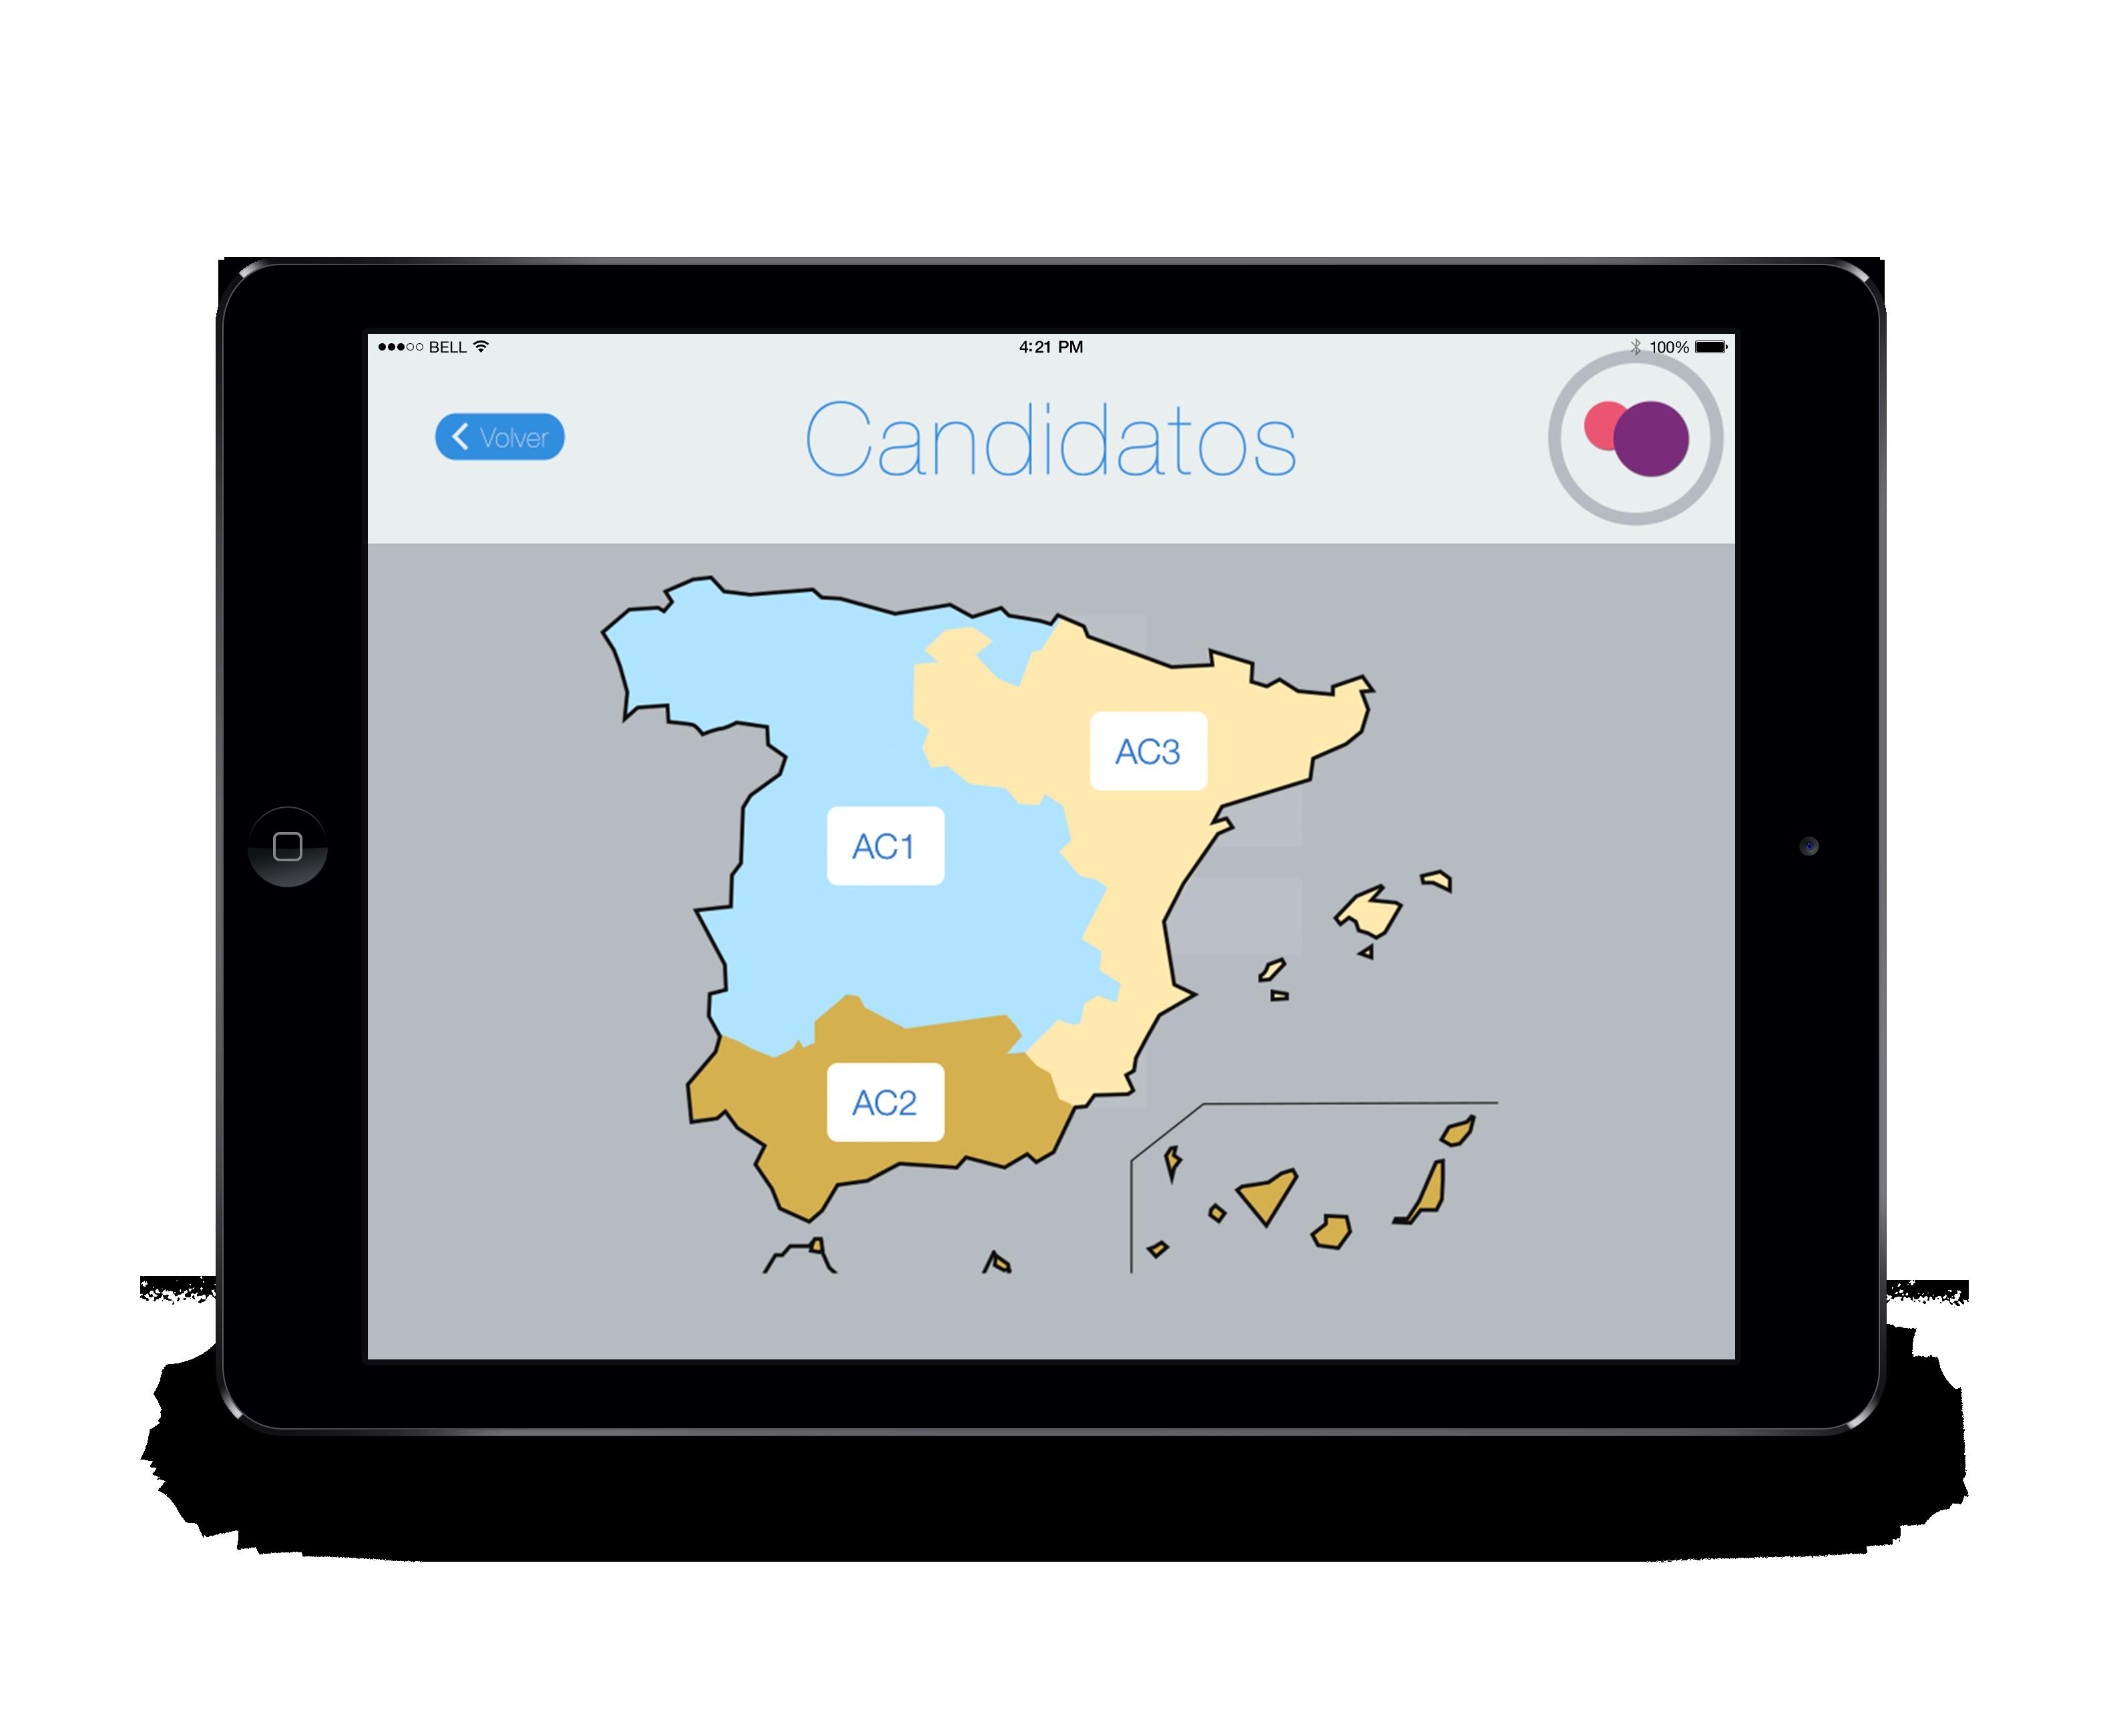 App curso Comunicación de alto impacto industria farmacéutica